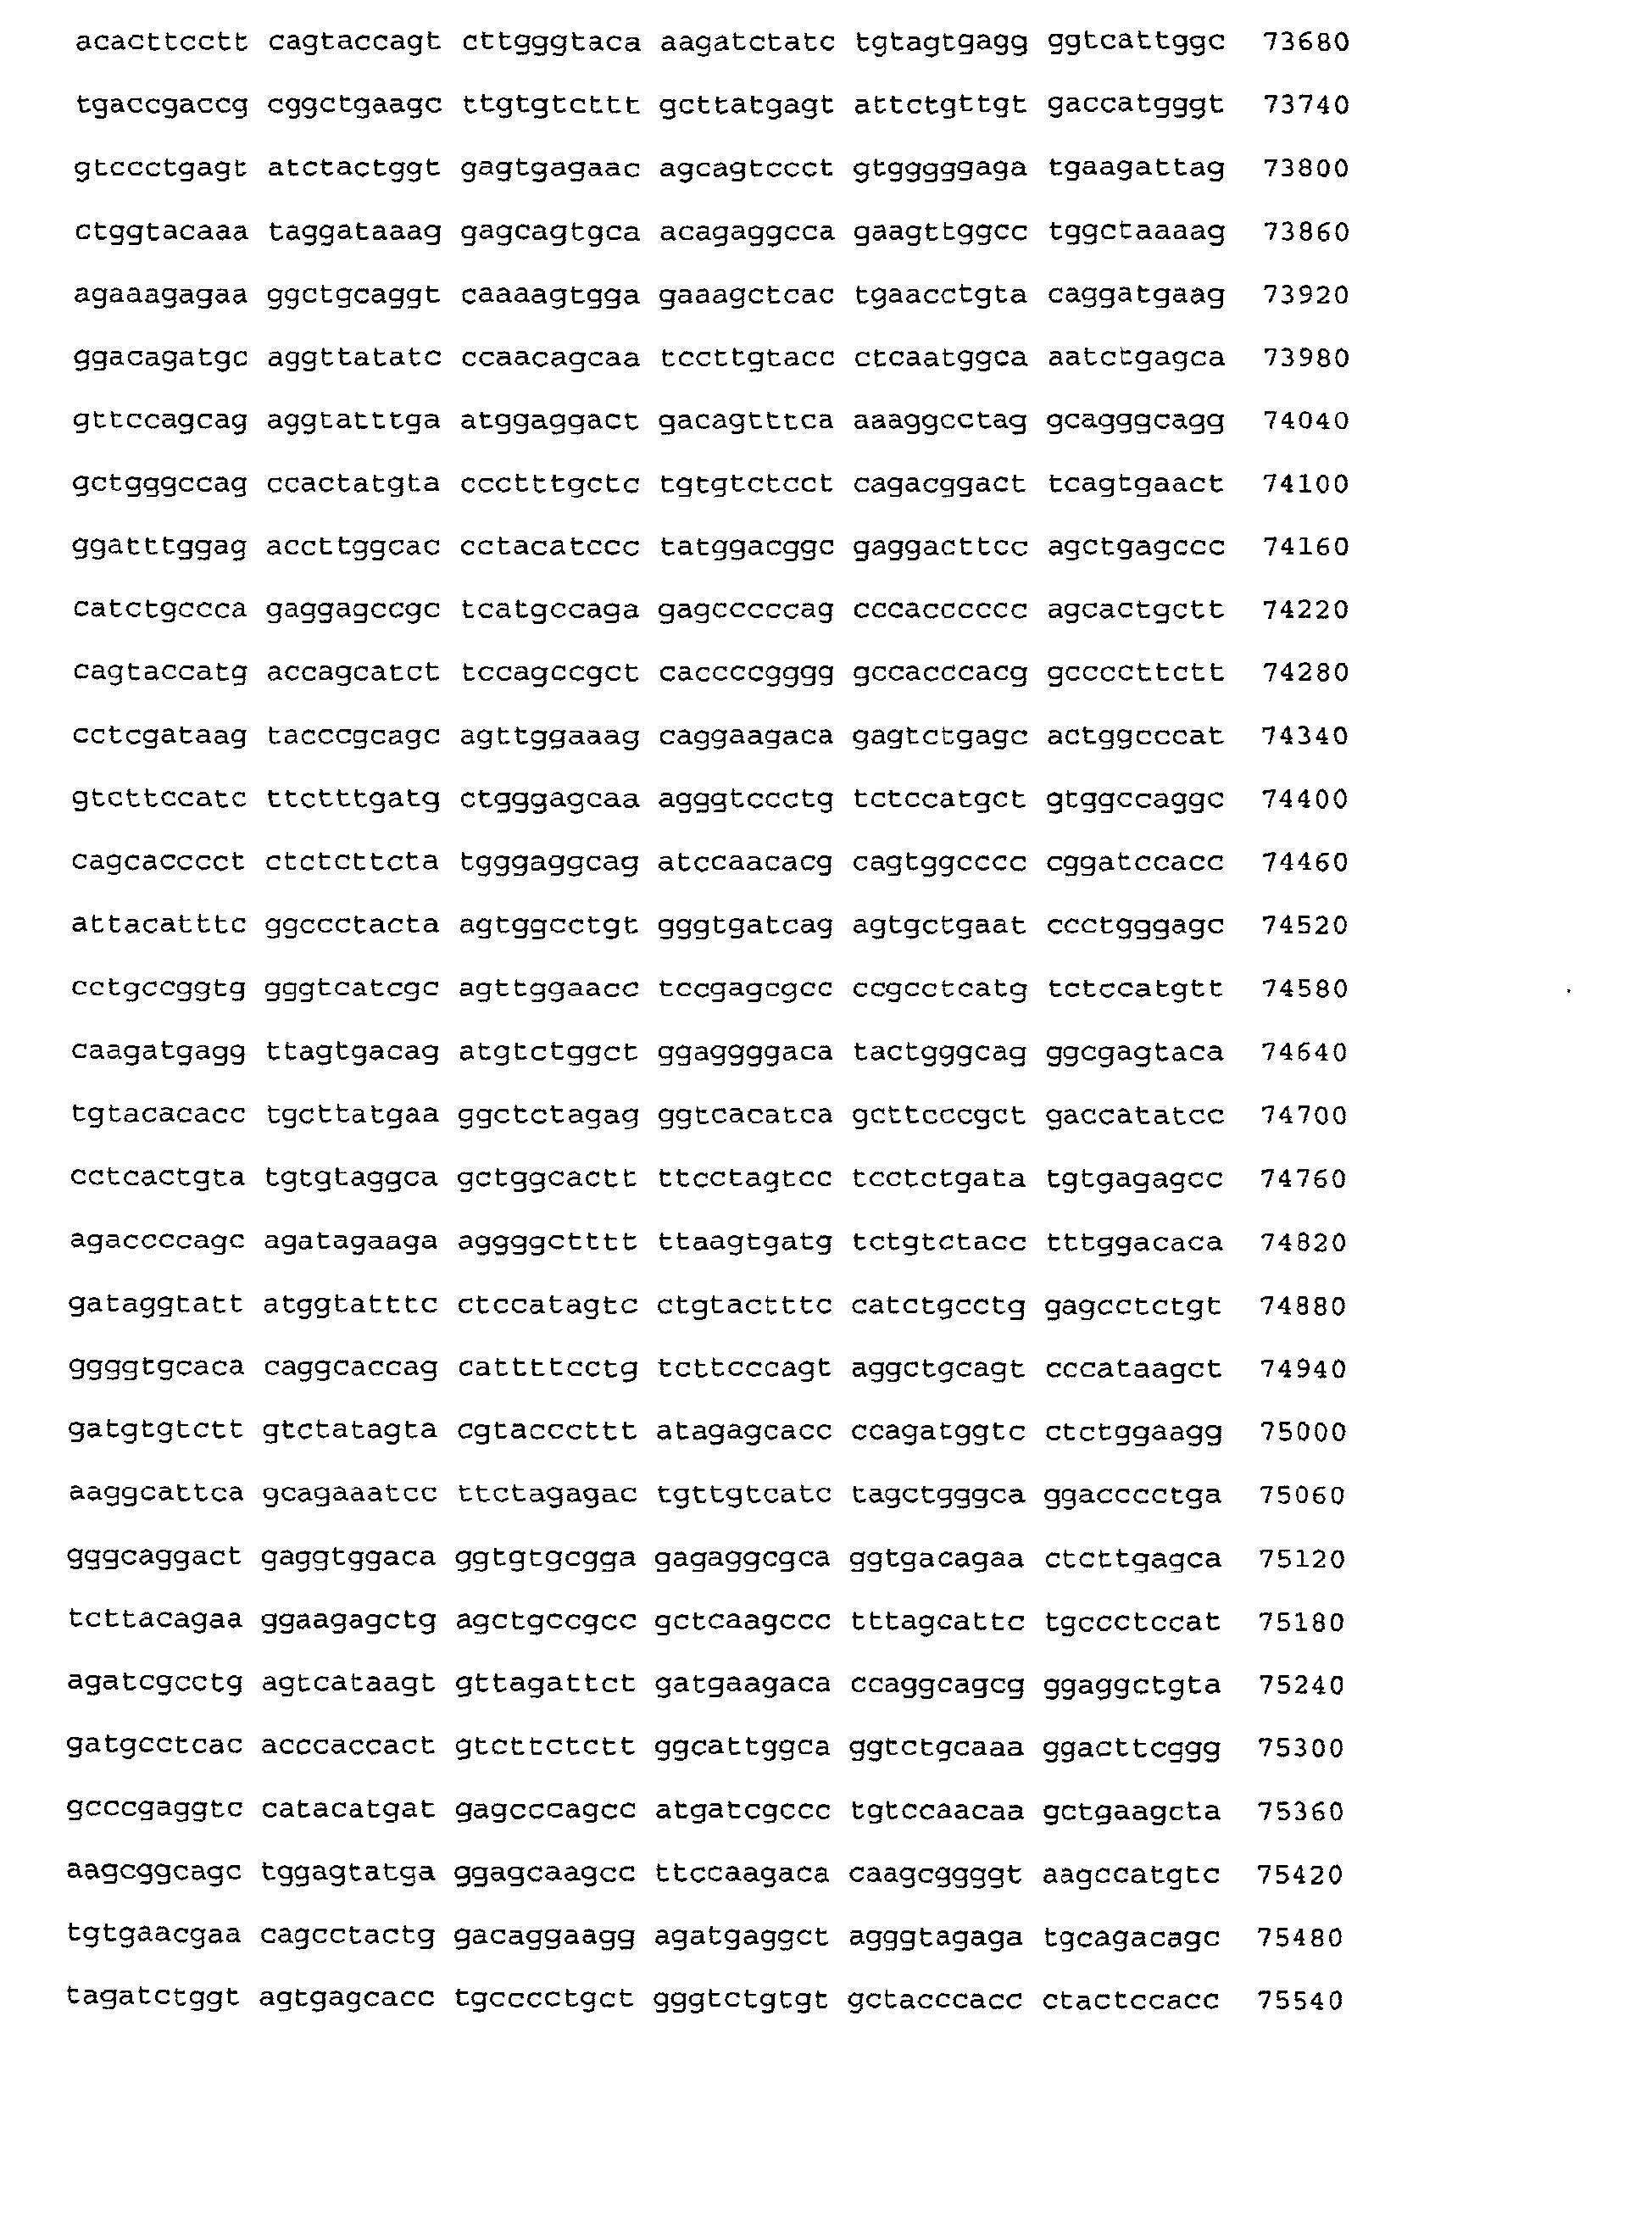 Figure imgb0144